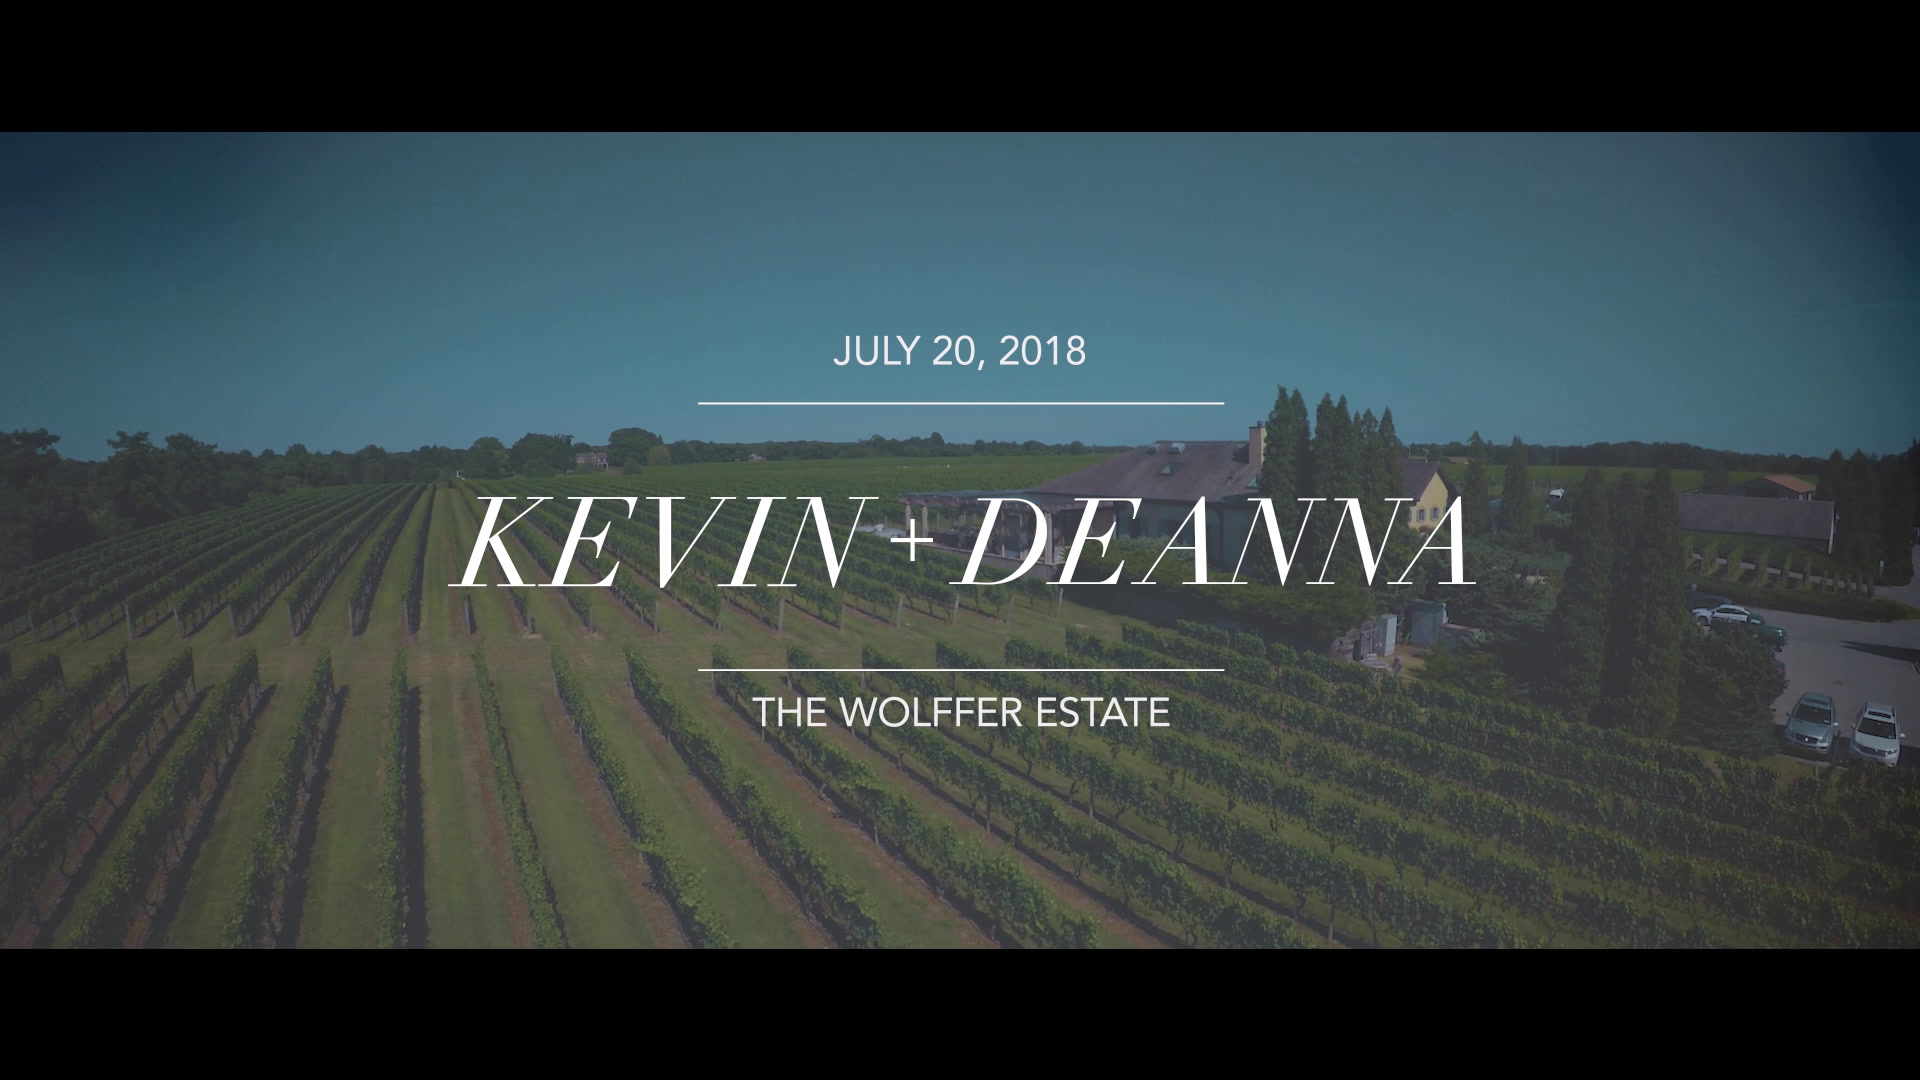 Kevin + Deanna | Sagaponack, New York | The Wolffer Estate